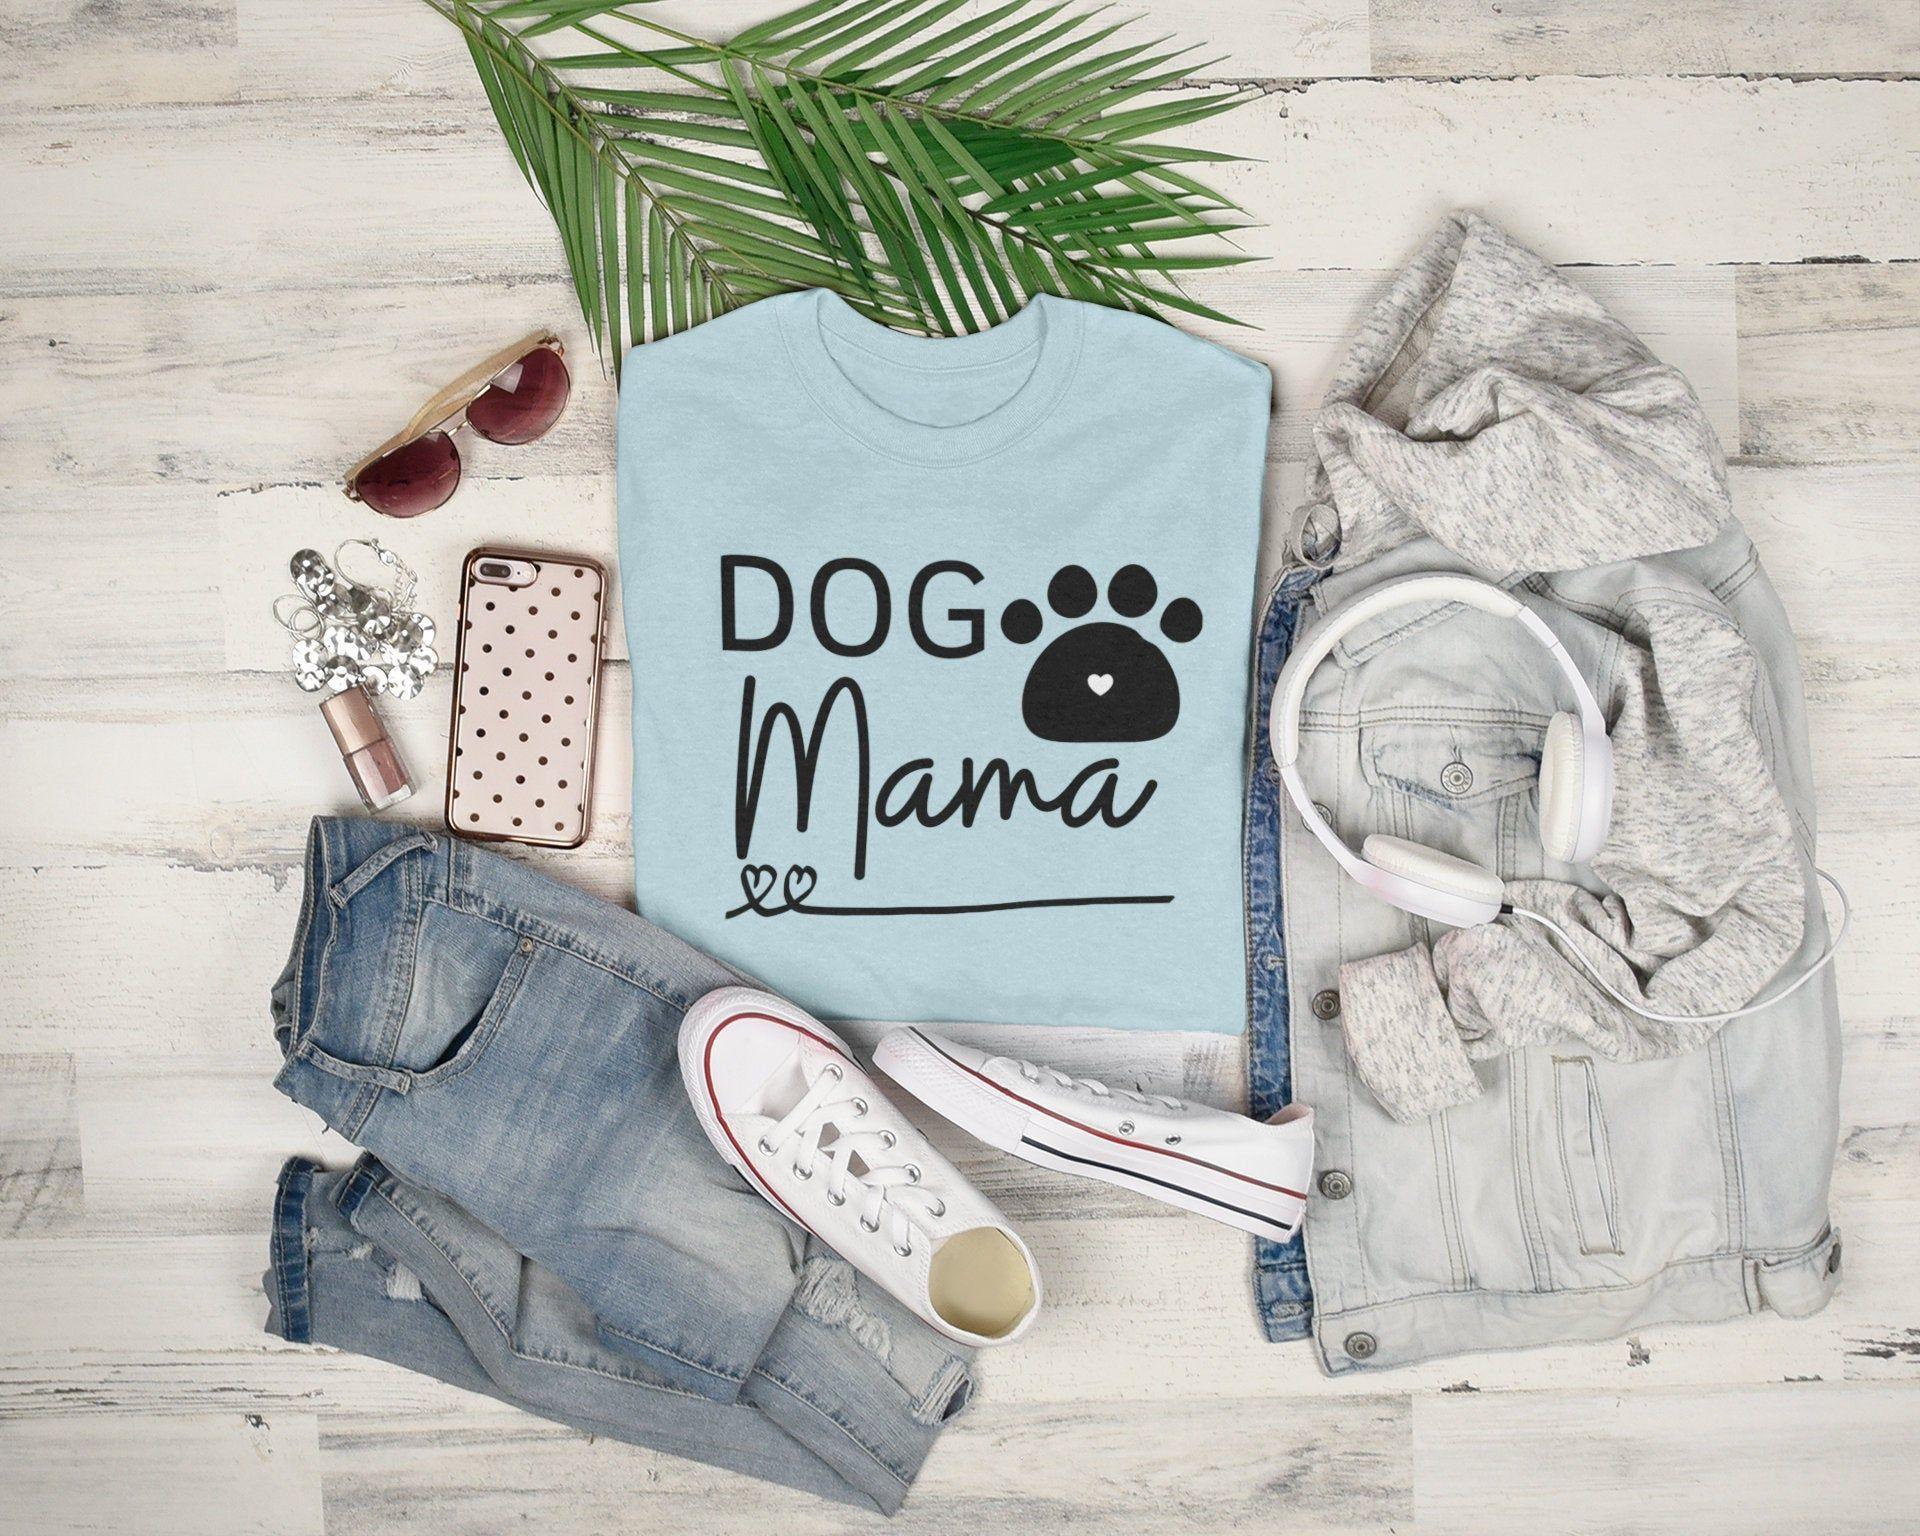 Dog Mama Tee Dog Moms Women's Graphic T Shirt Gift | Etsy in 2020